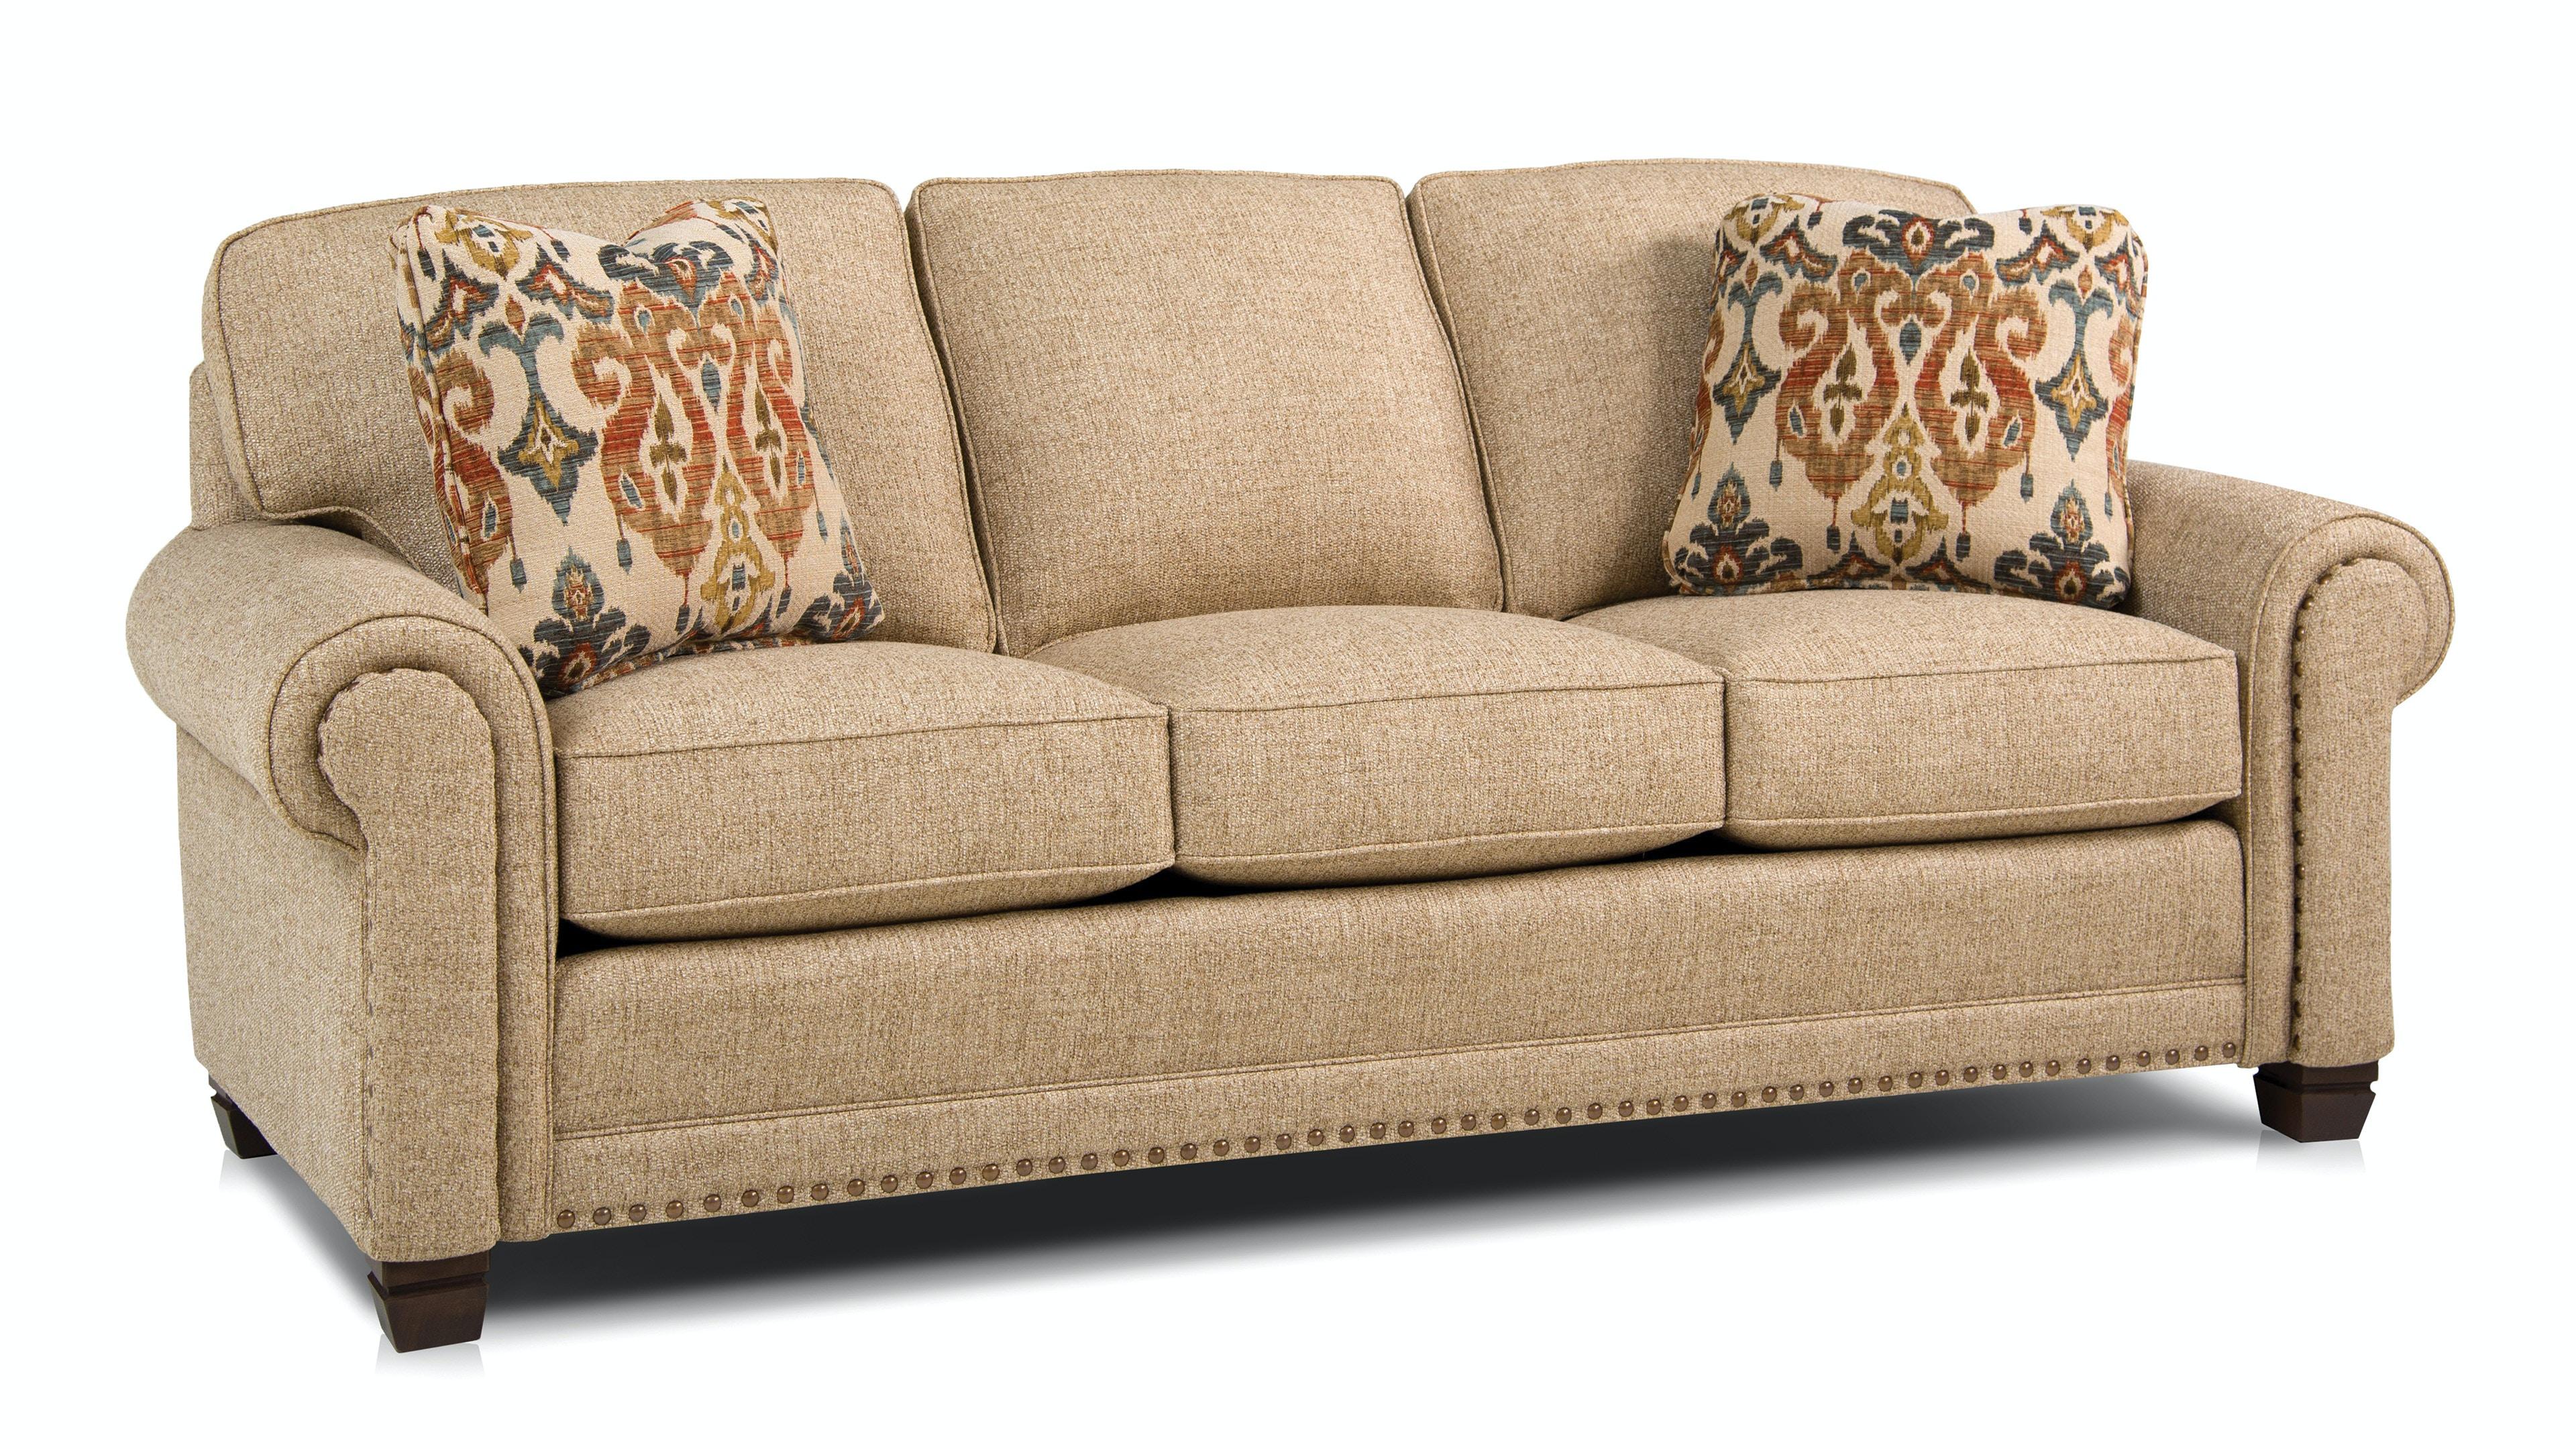 smith brothers living room three cushion sofa 393 10 brothers office furniture - reading rg2 brothers office furniture milwaukee